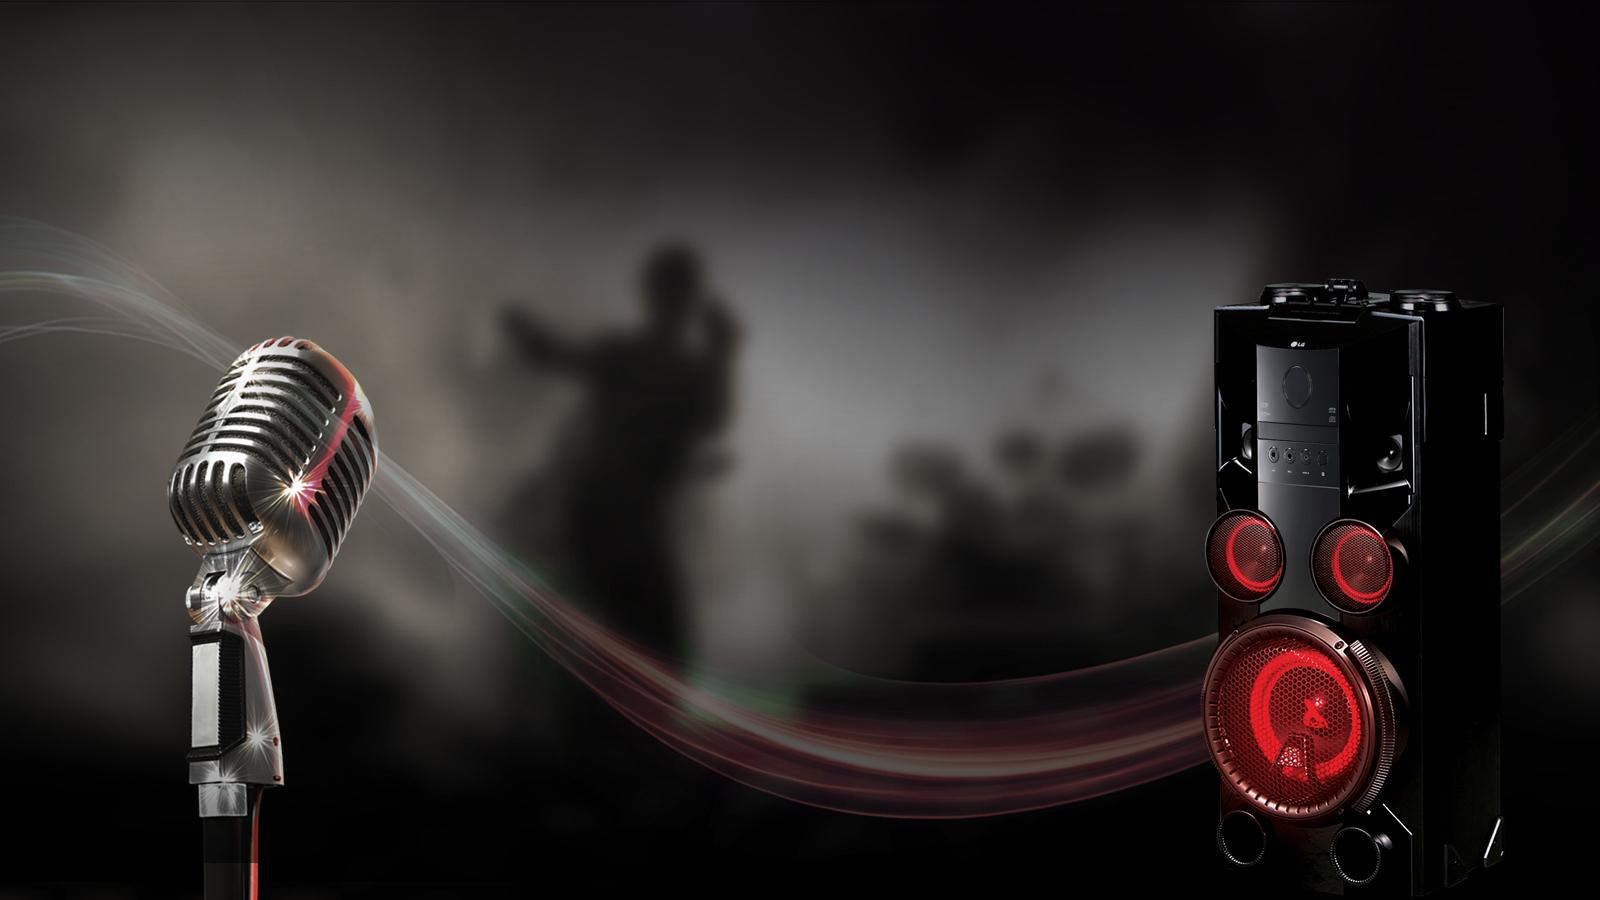 Chaine hifi - OM5560 - Noir